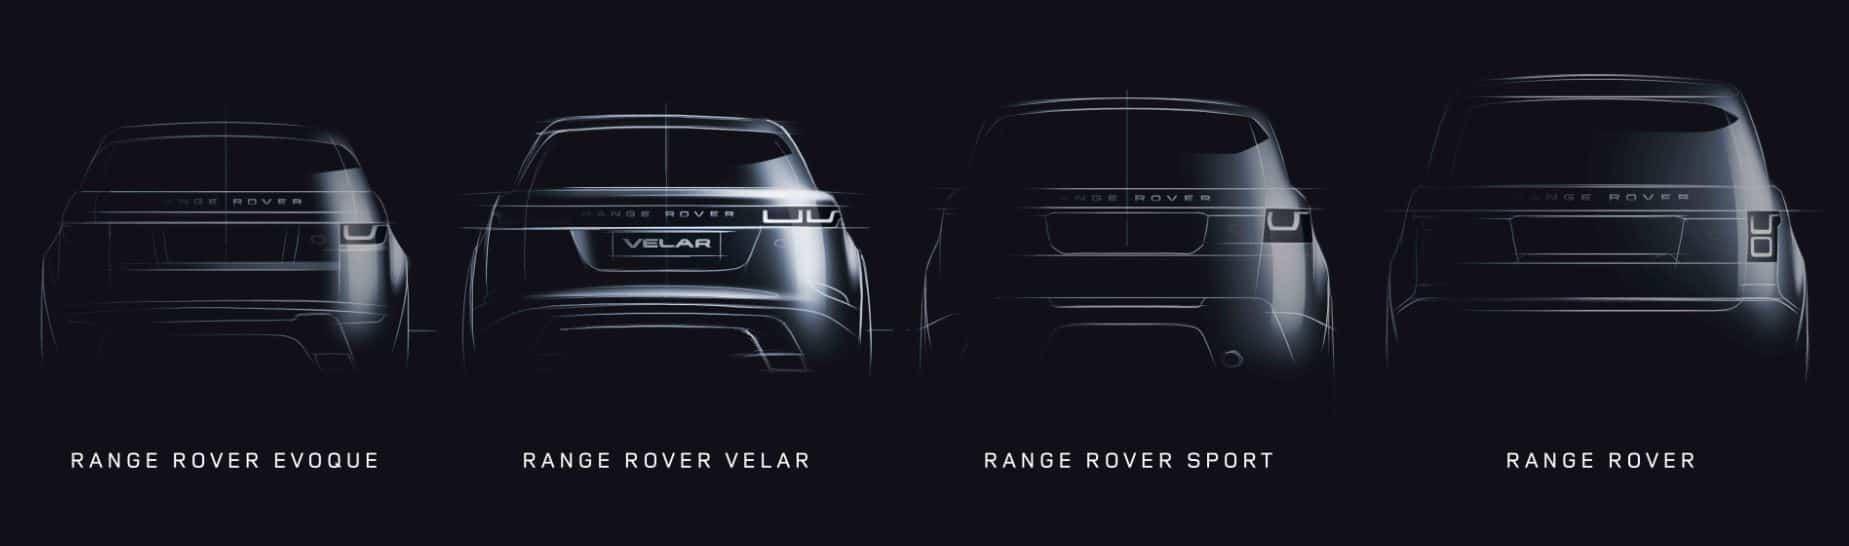 Familia Range Rover 2017